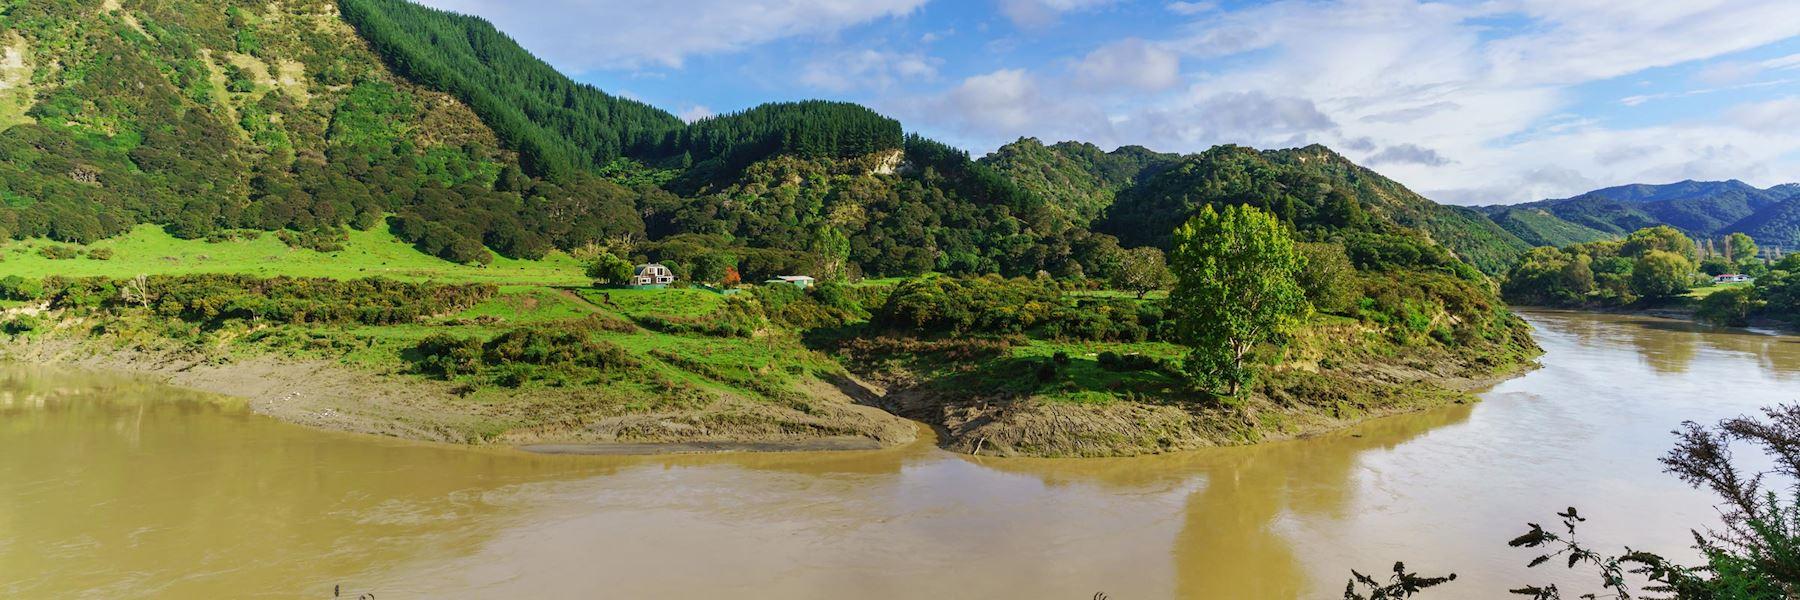 Visit Whanganui National Park, New Zealand